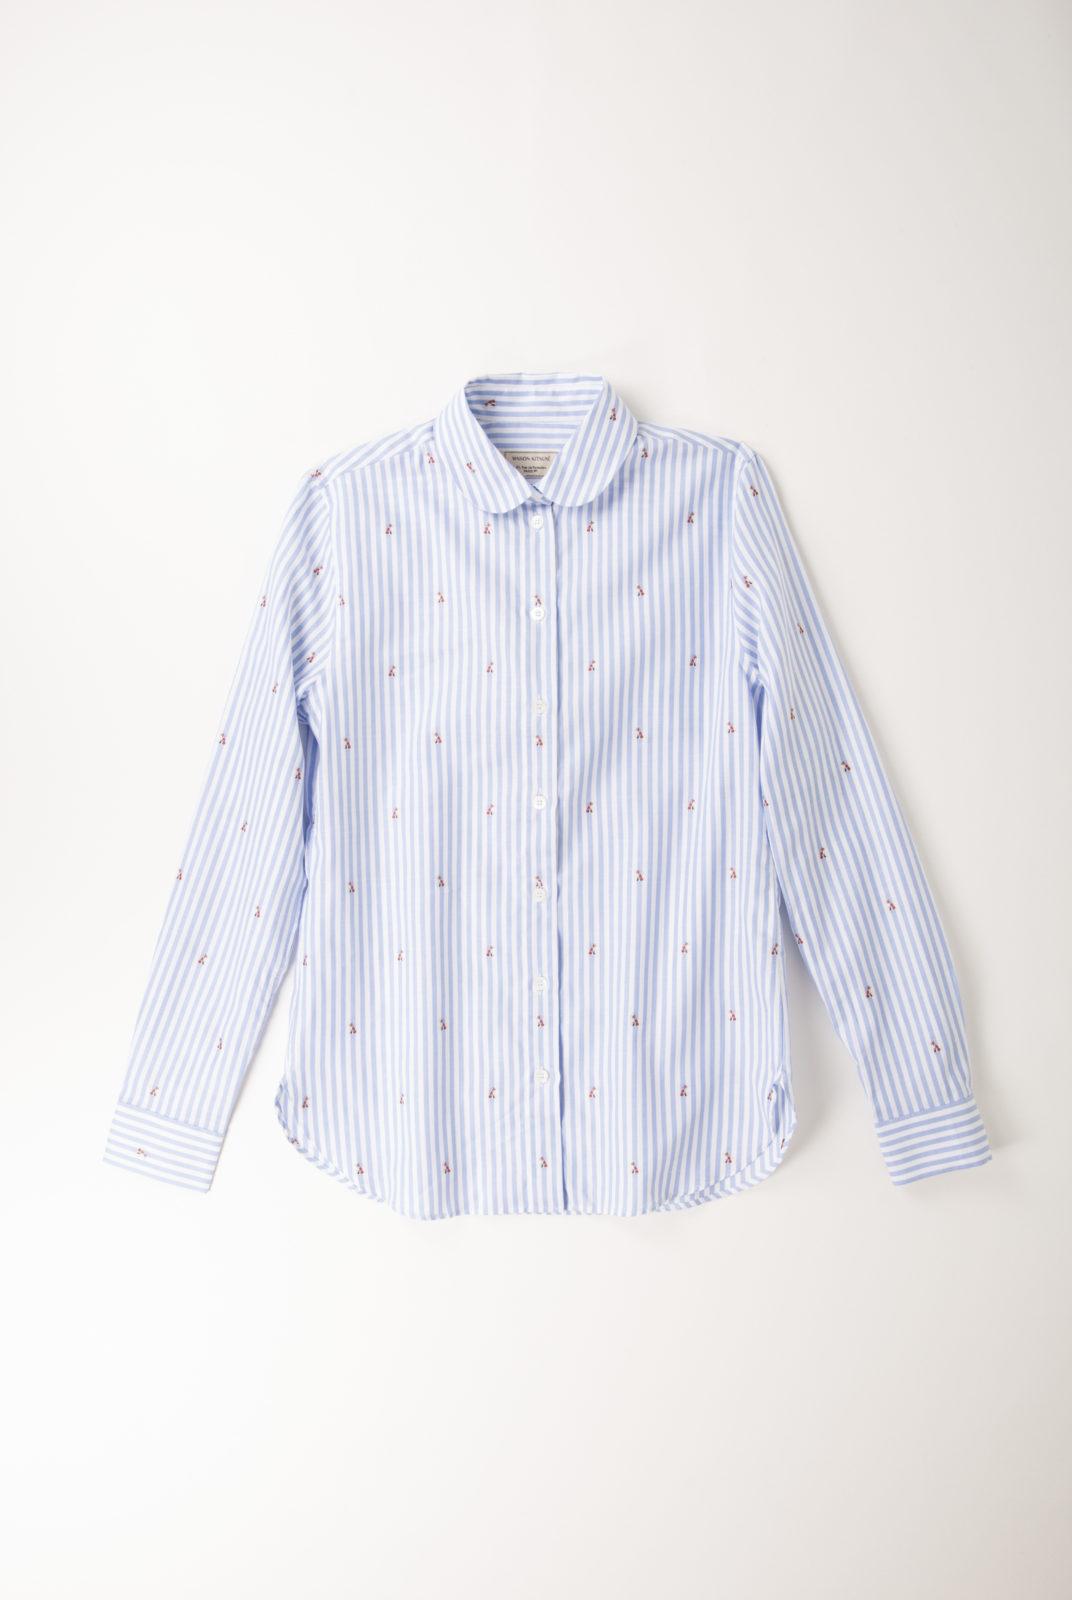 chemise, rayure, baby fox, bleu ciel, col claudine, coupe droite, kitsune